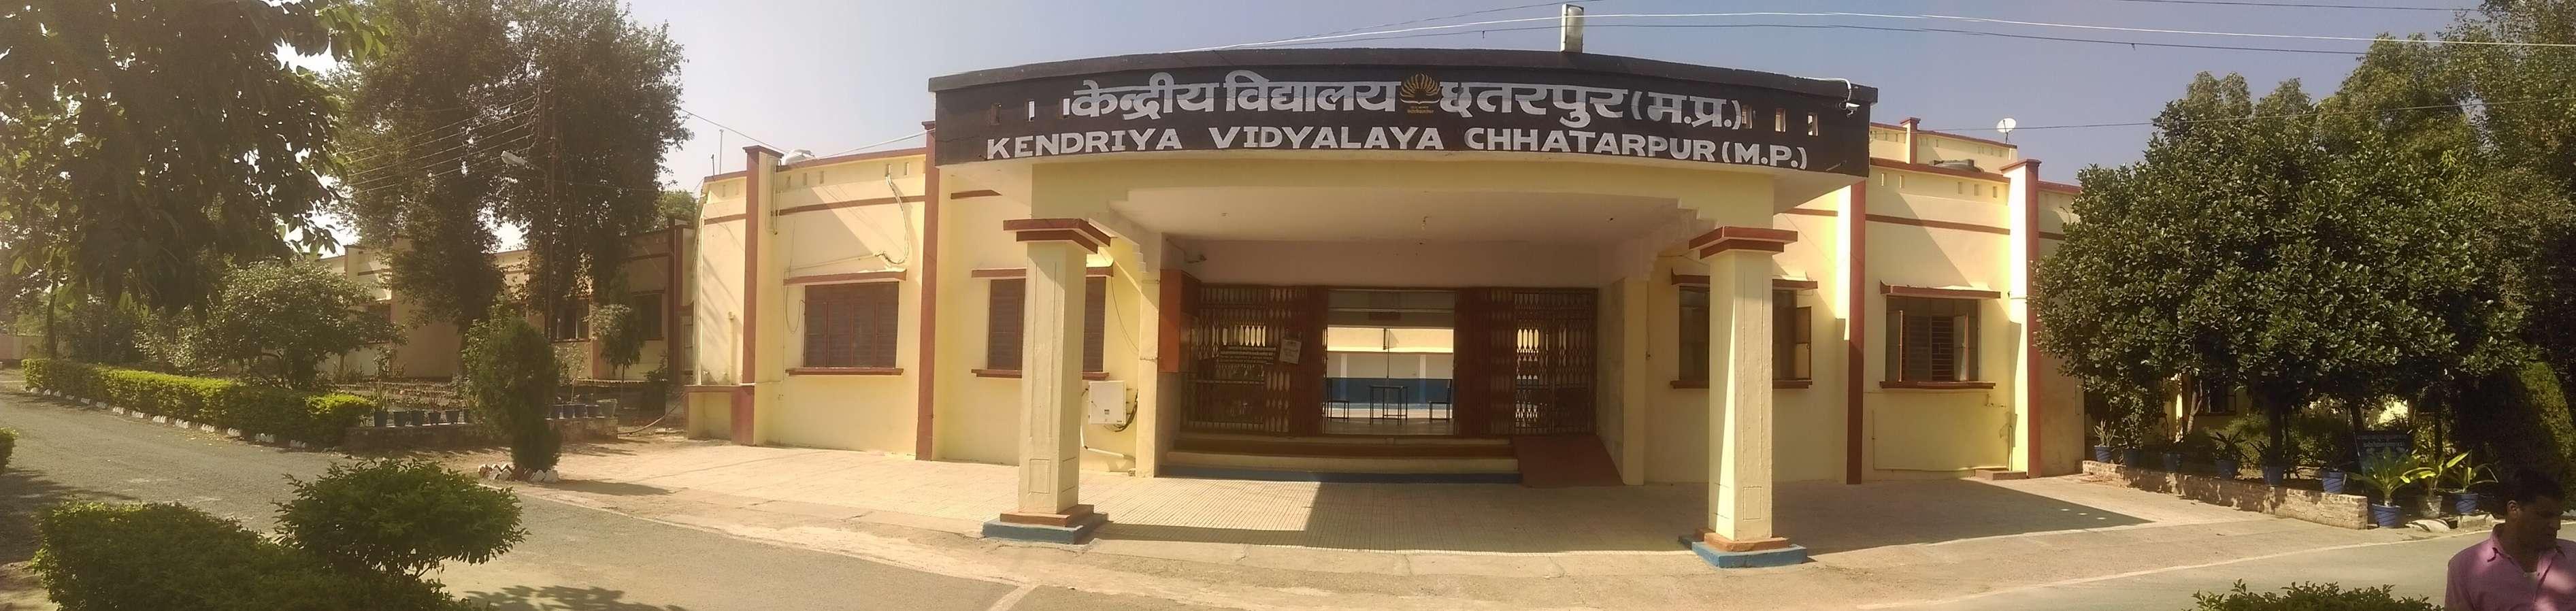 KENDRIYA VIDAYALAYA MAHOBA ROAD OPP RTO OFFICE CHHATARPUR MADHYA PRADESH 1000060